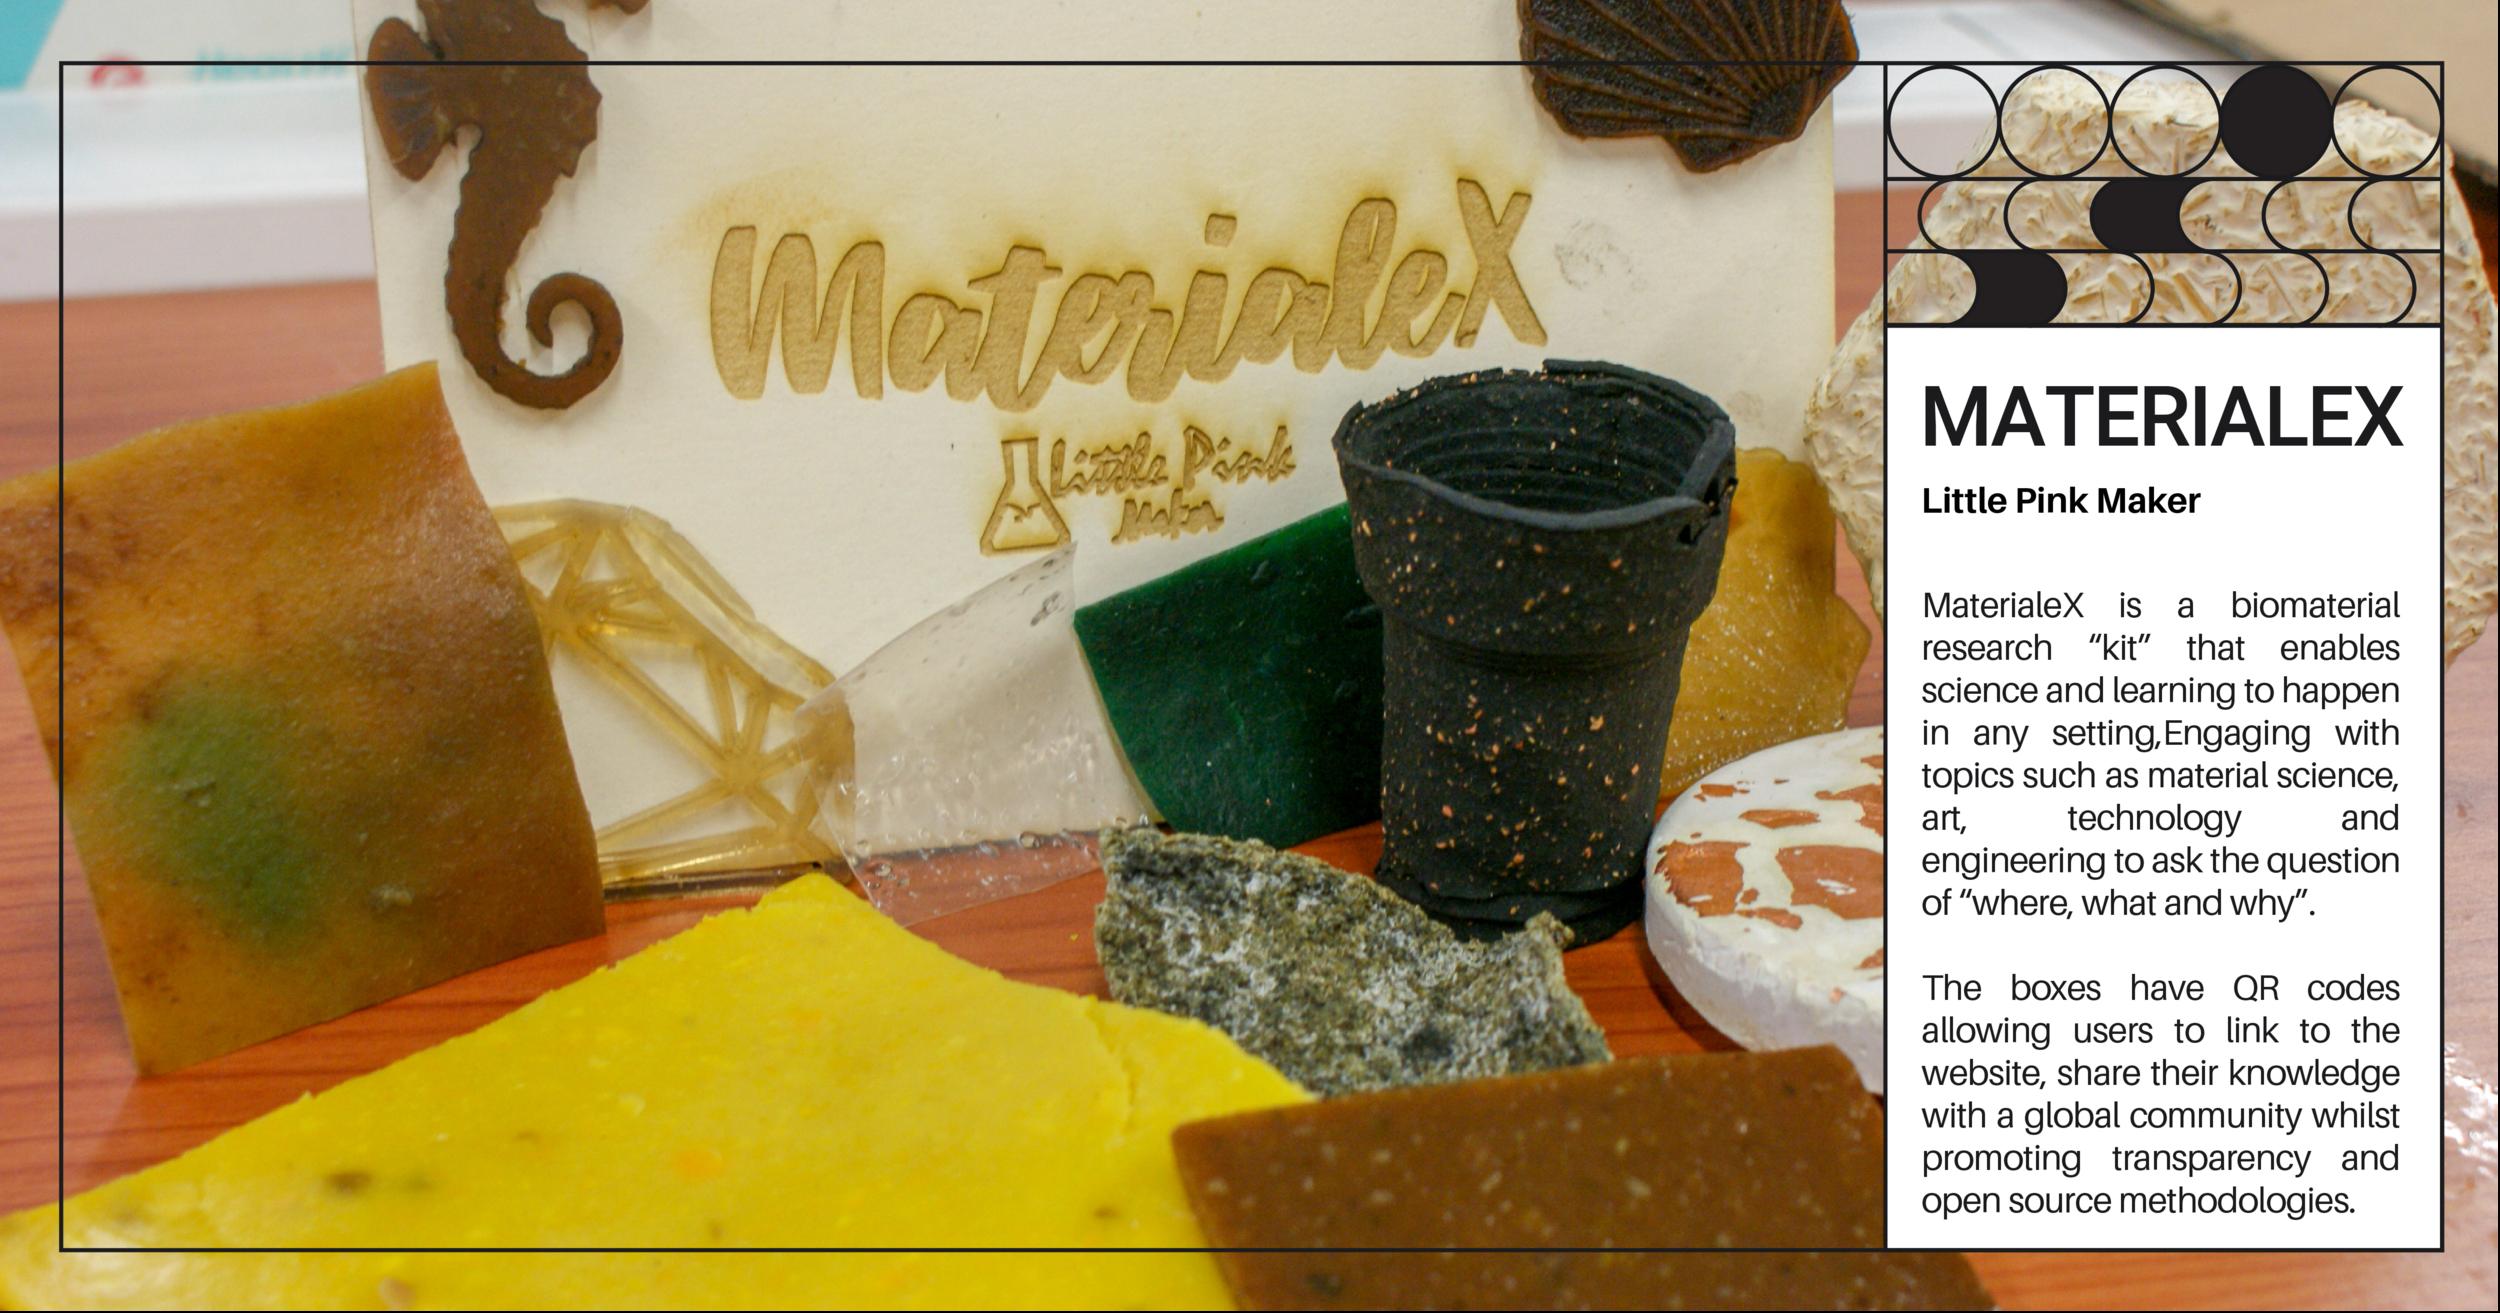 A25_04 MaterialeX-01.png